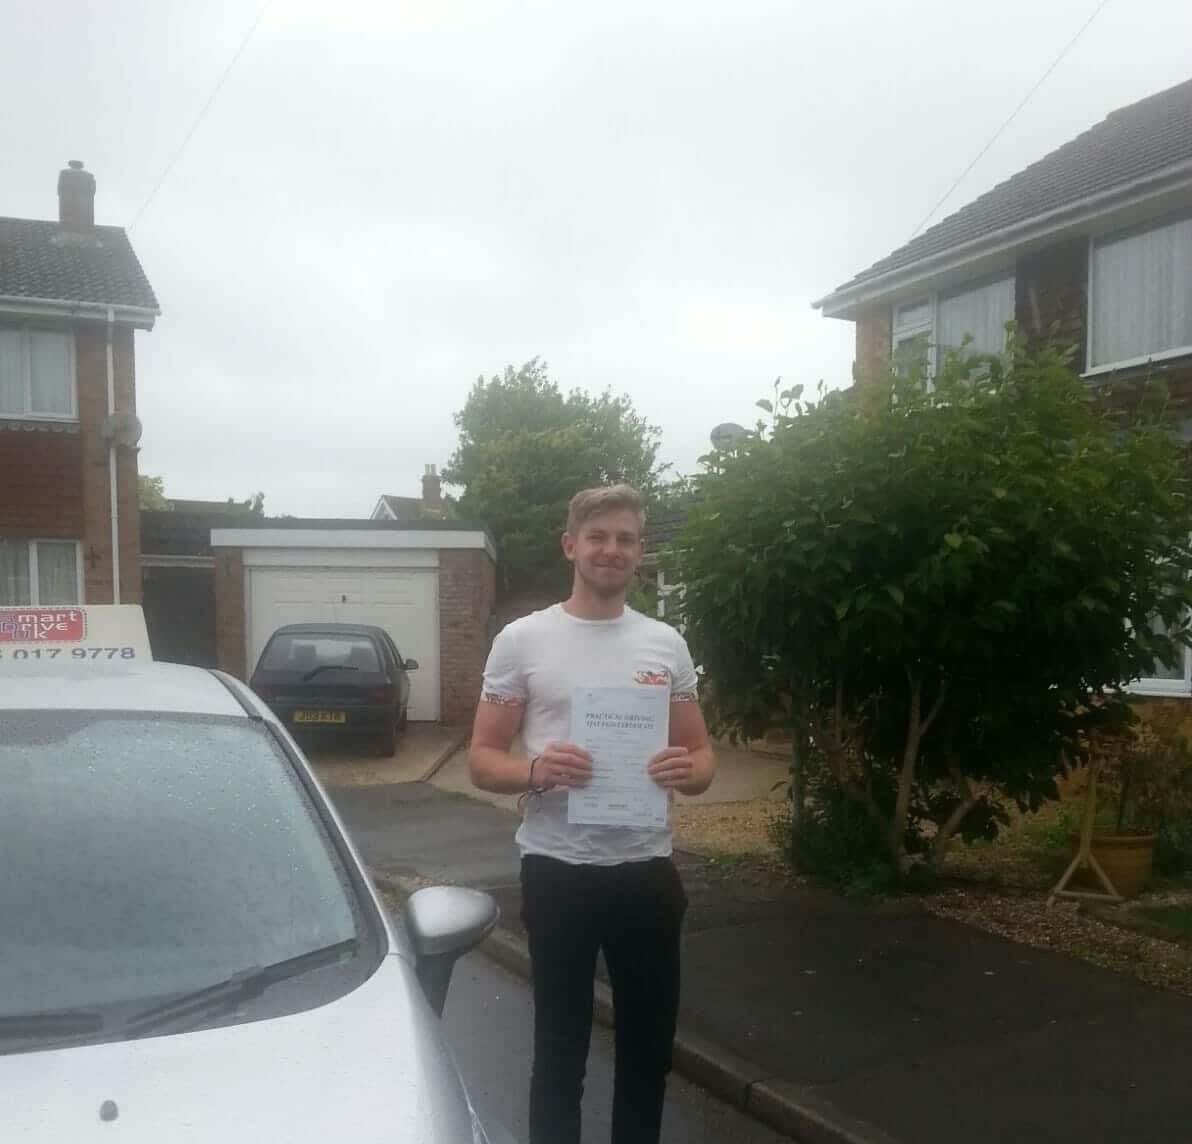 Congratulations to Adam Corbin of Lymington